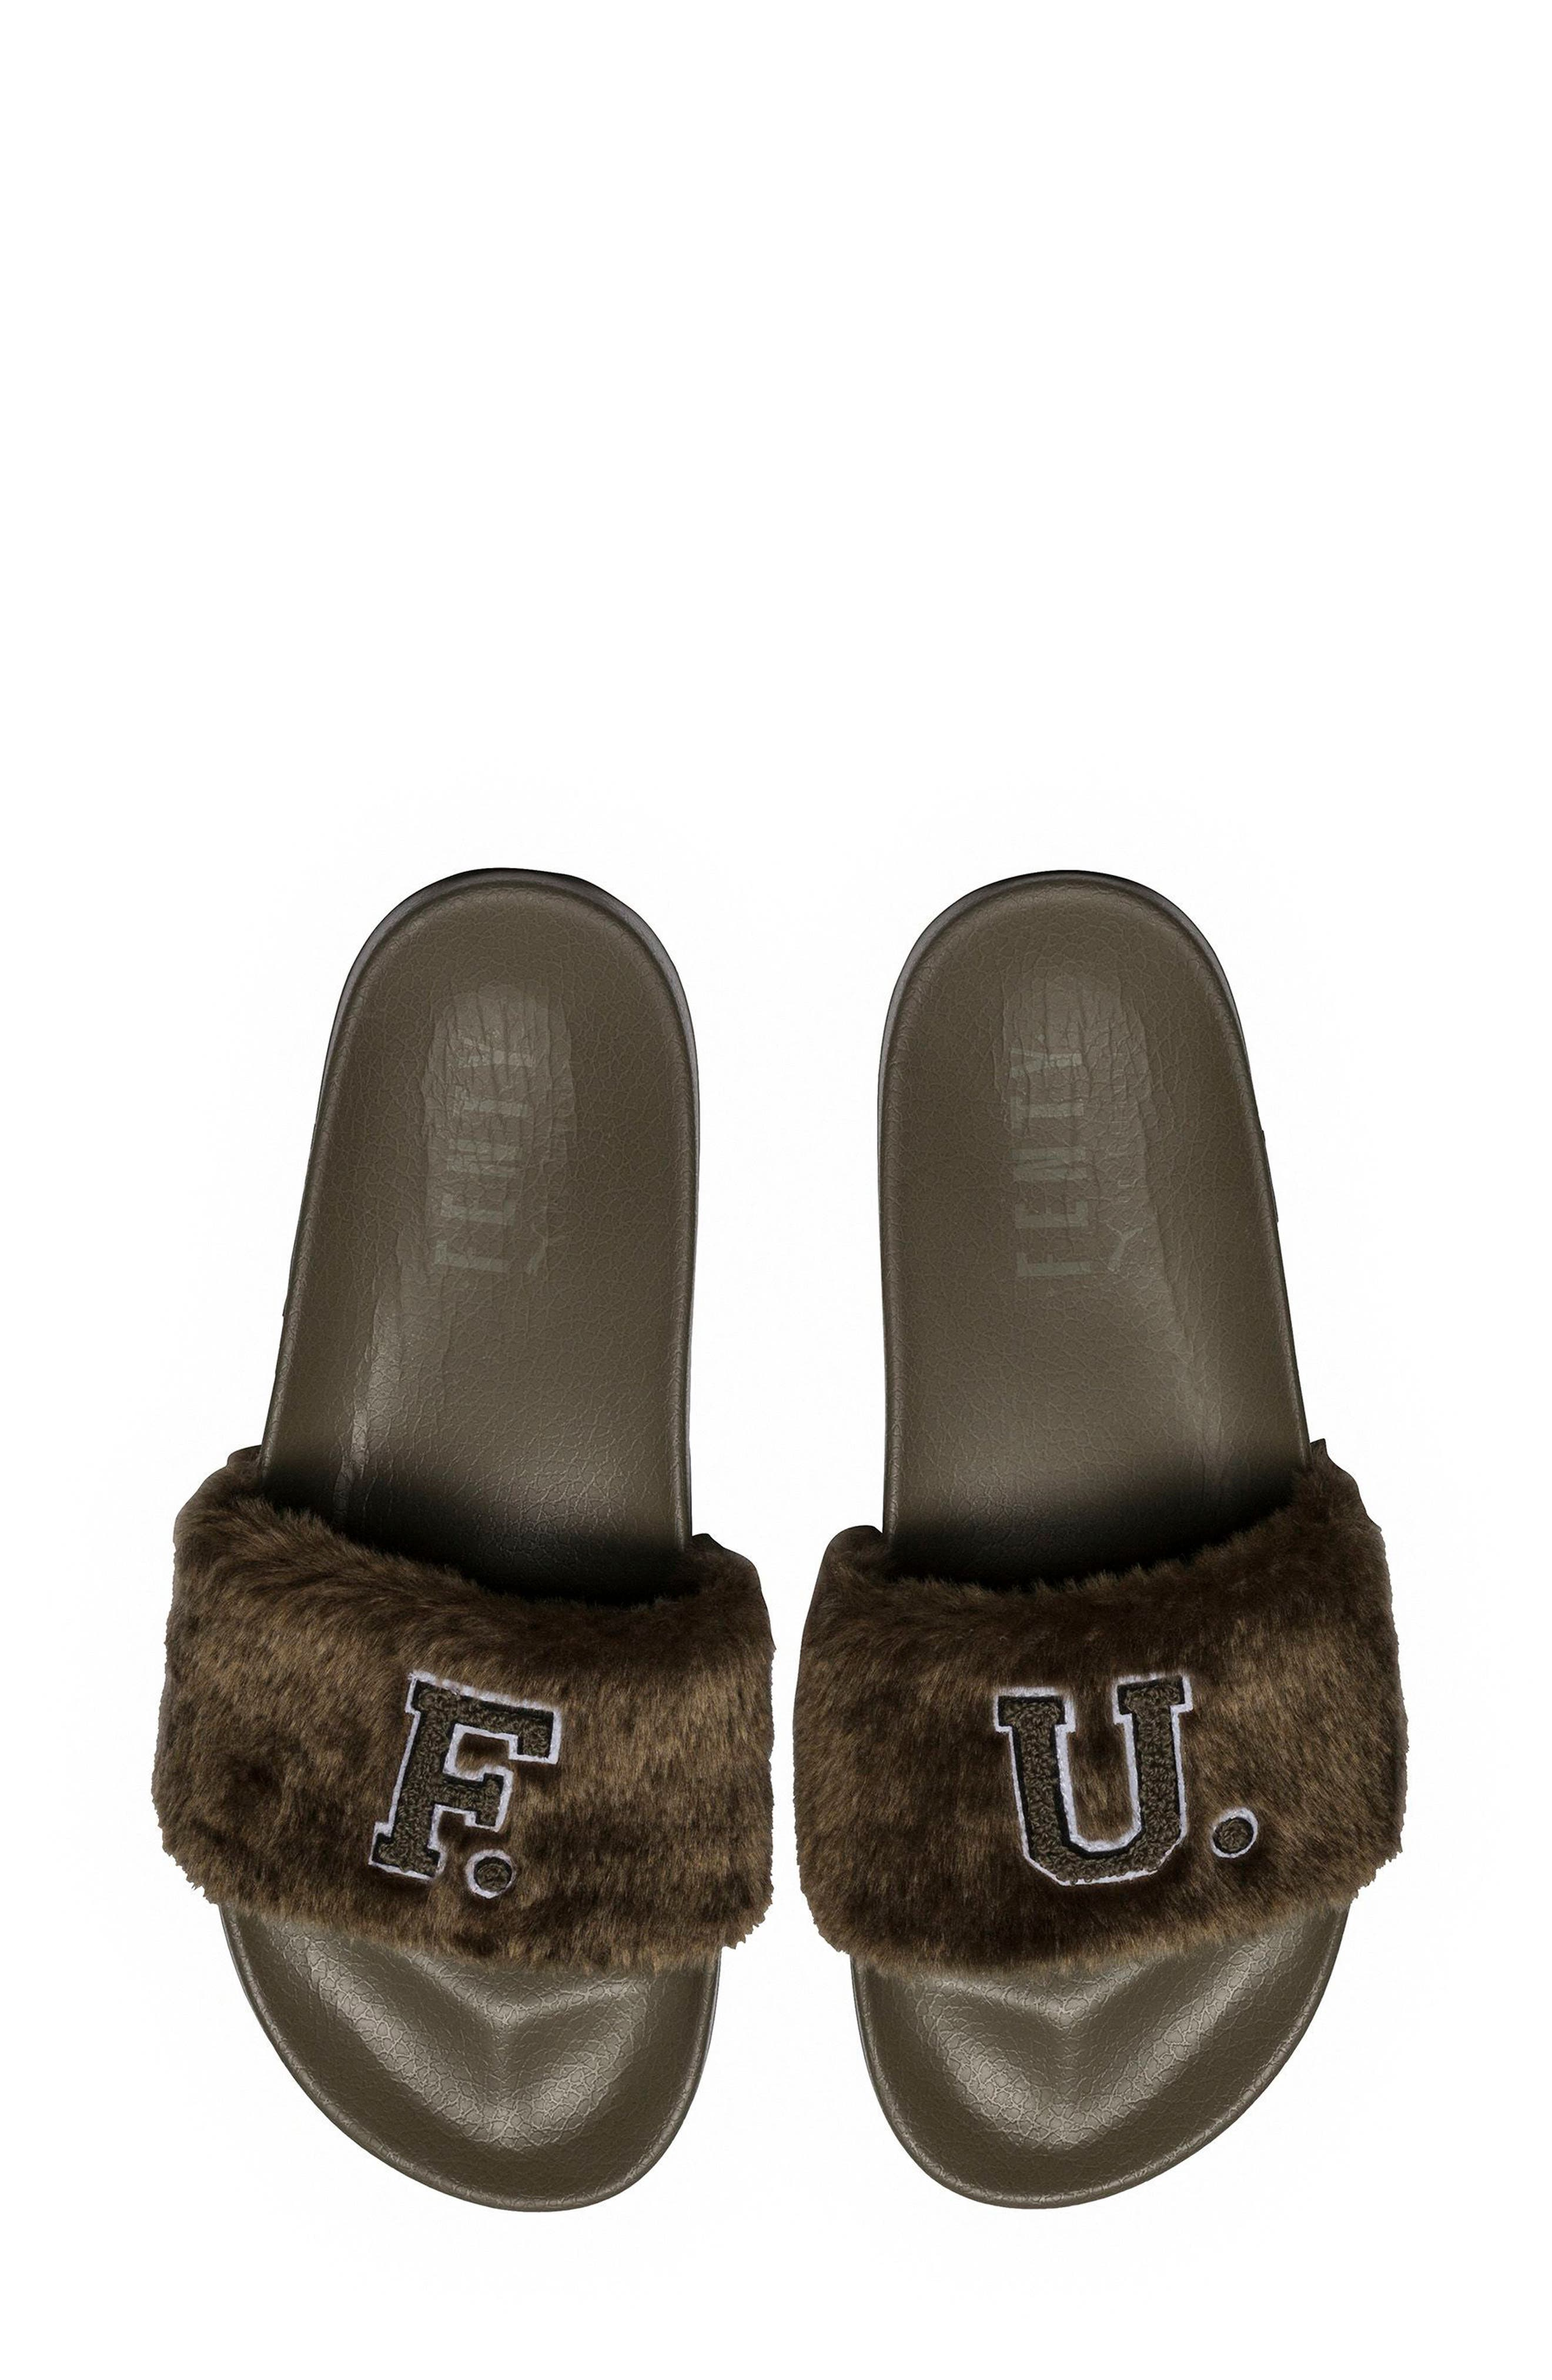 Alternate Image 1 Selected - FENTY PUMA by Rihanna Lead Cat Slide Sandals (Women)